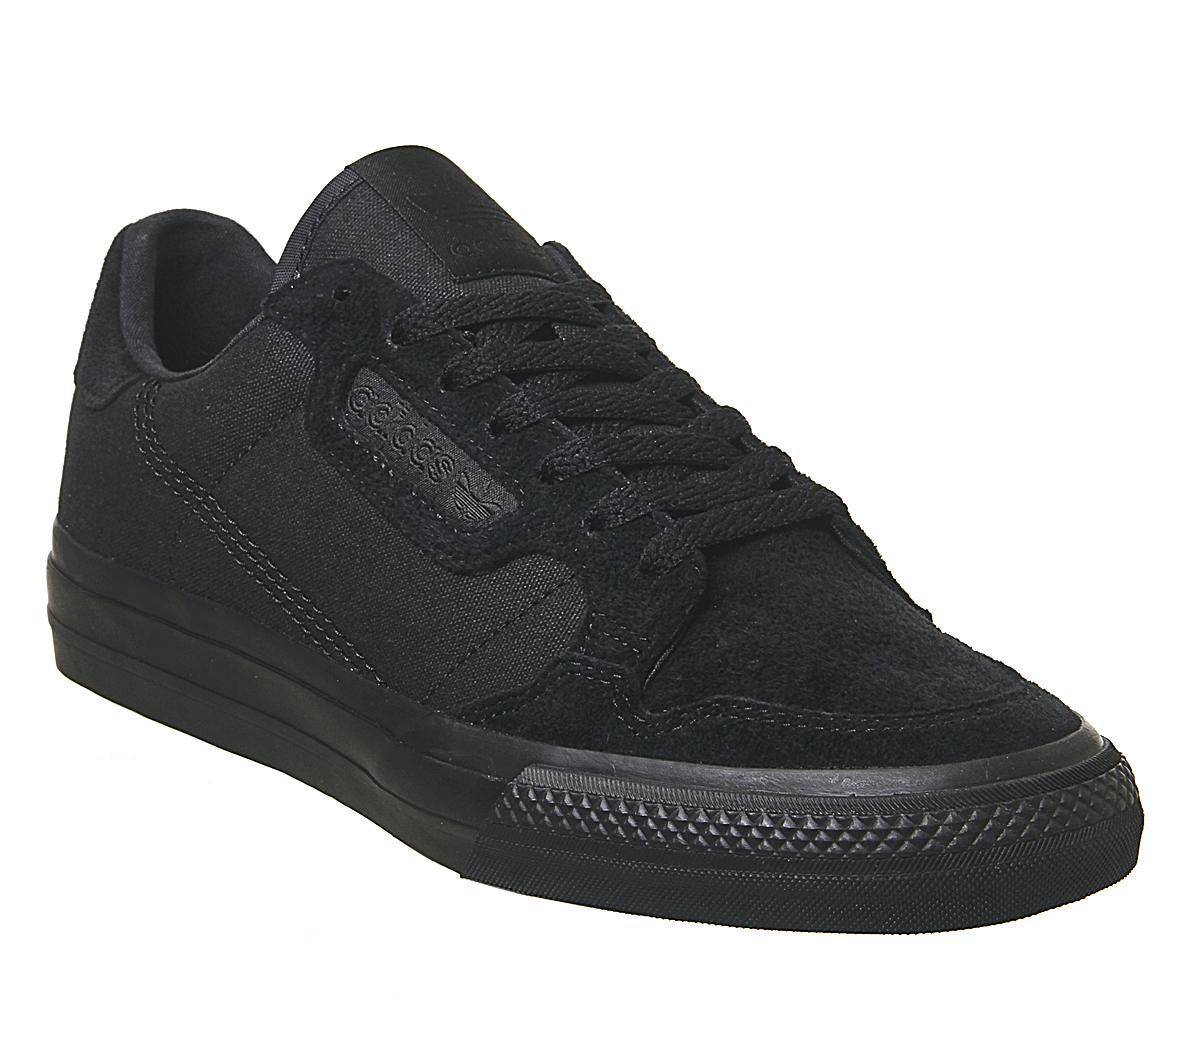 adidas Continental Vulc Trainers Black